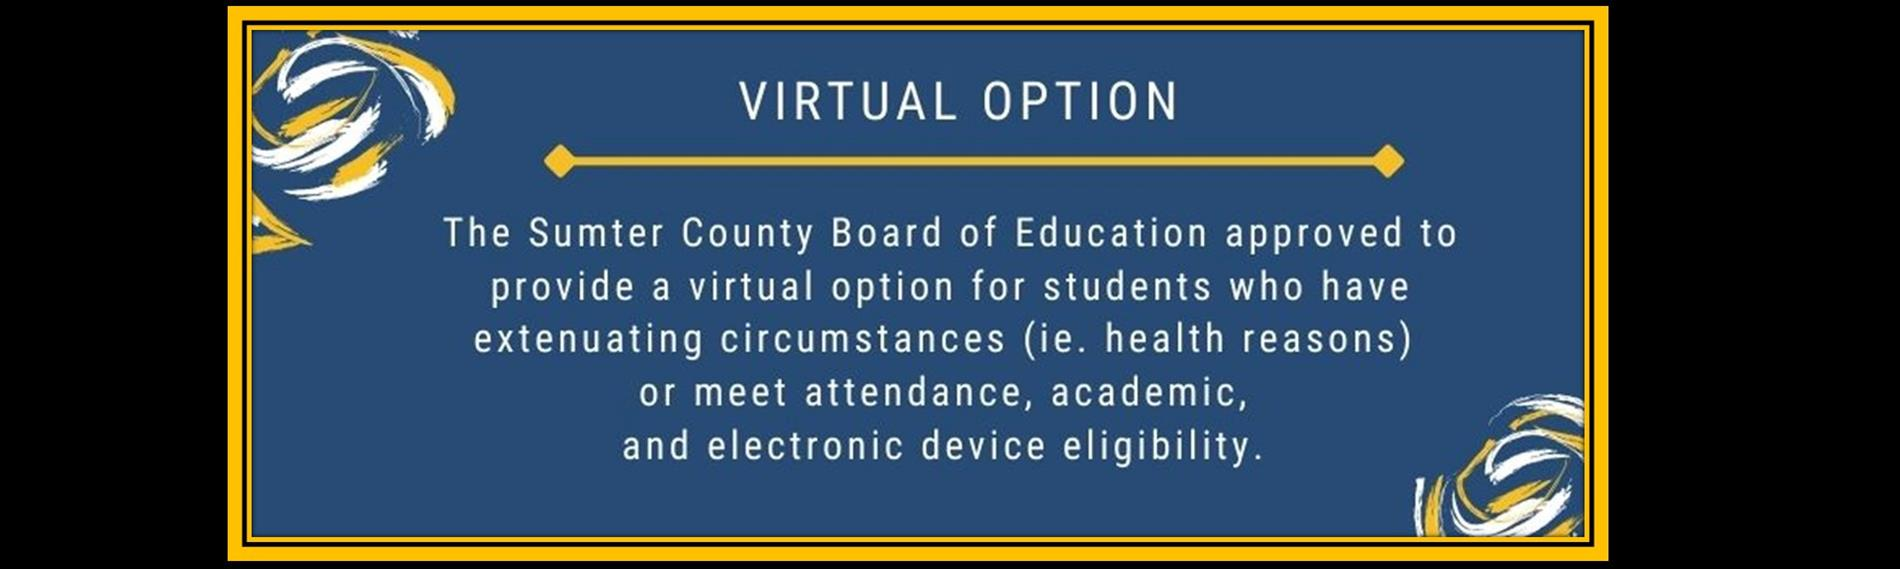 Virtual Option